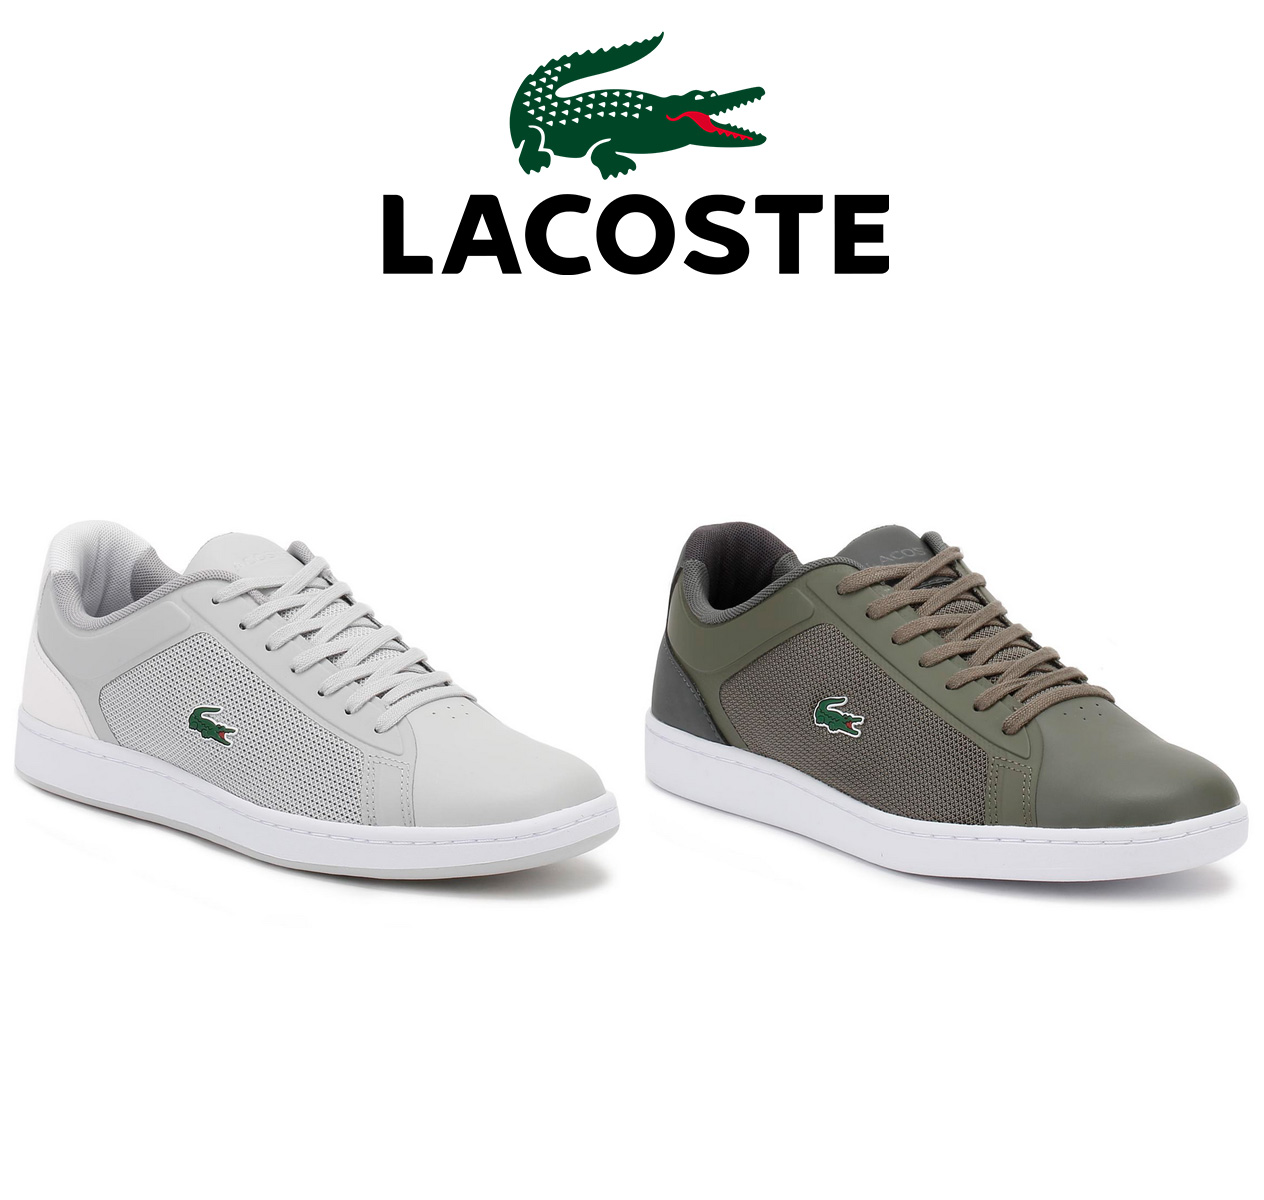 Lacoste Hombres Khaki L.Ight 217 1 SPM Zapatillas-UK 6 N1cTsci9fX